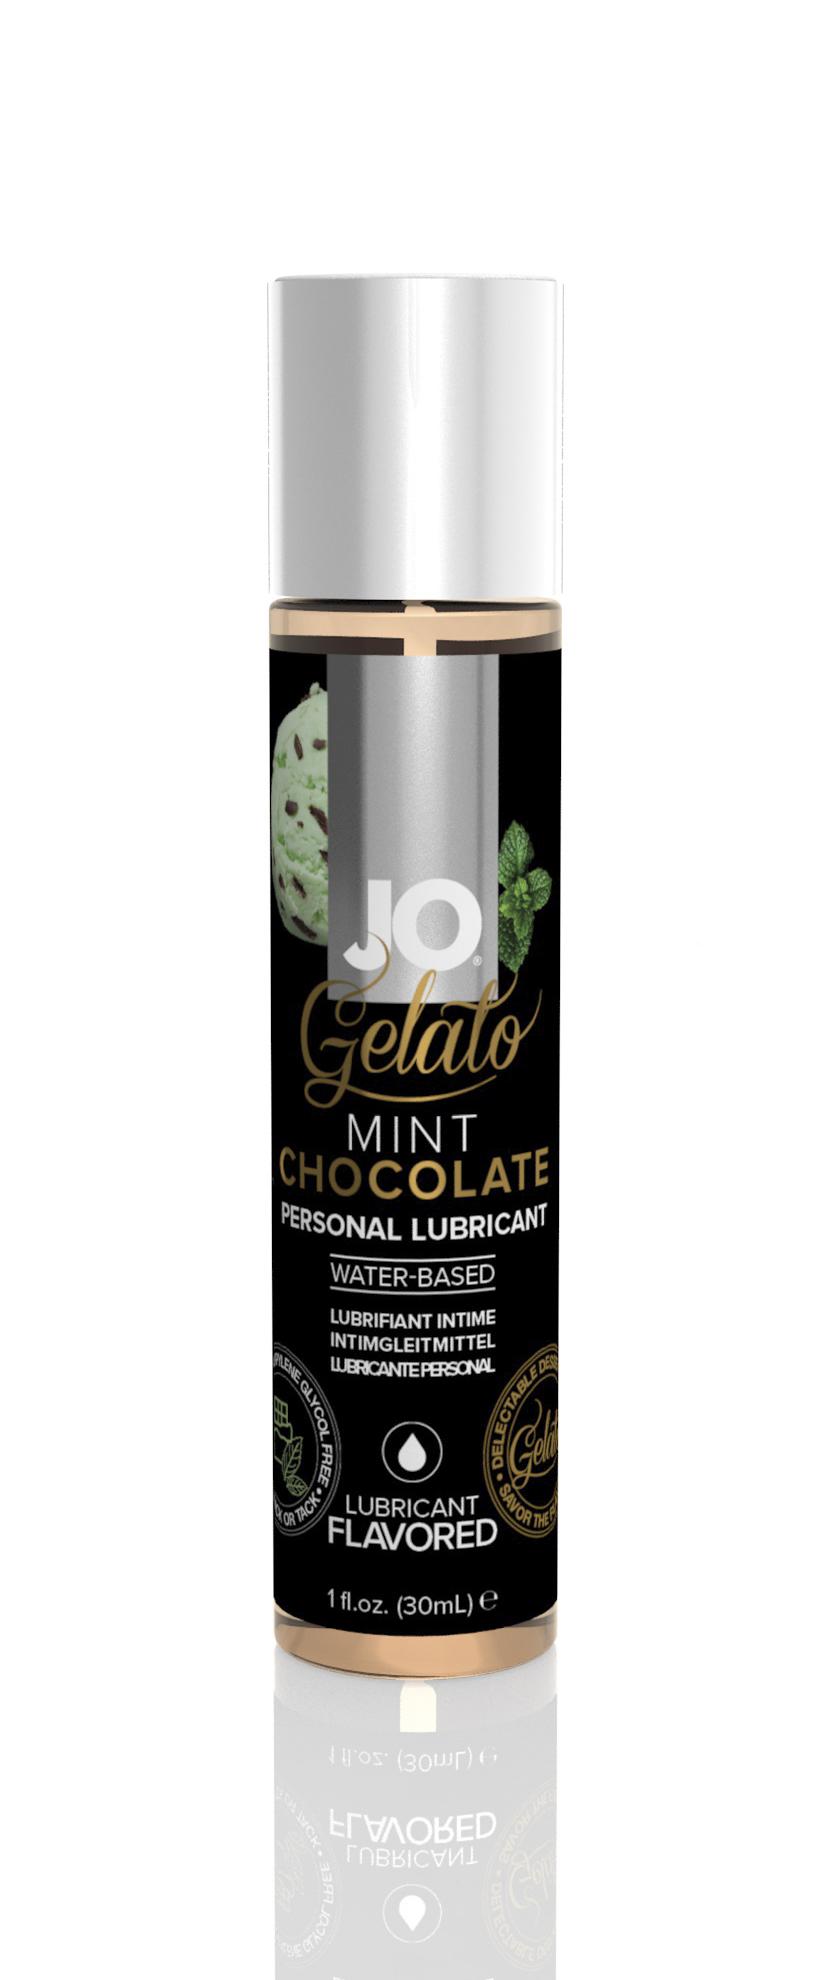 41022 - JO GELATO - MINT CHOCOLATE - LUBRICANT (WATER-BASED) 1 floz 30 mL.jpg